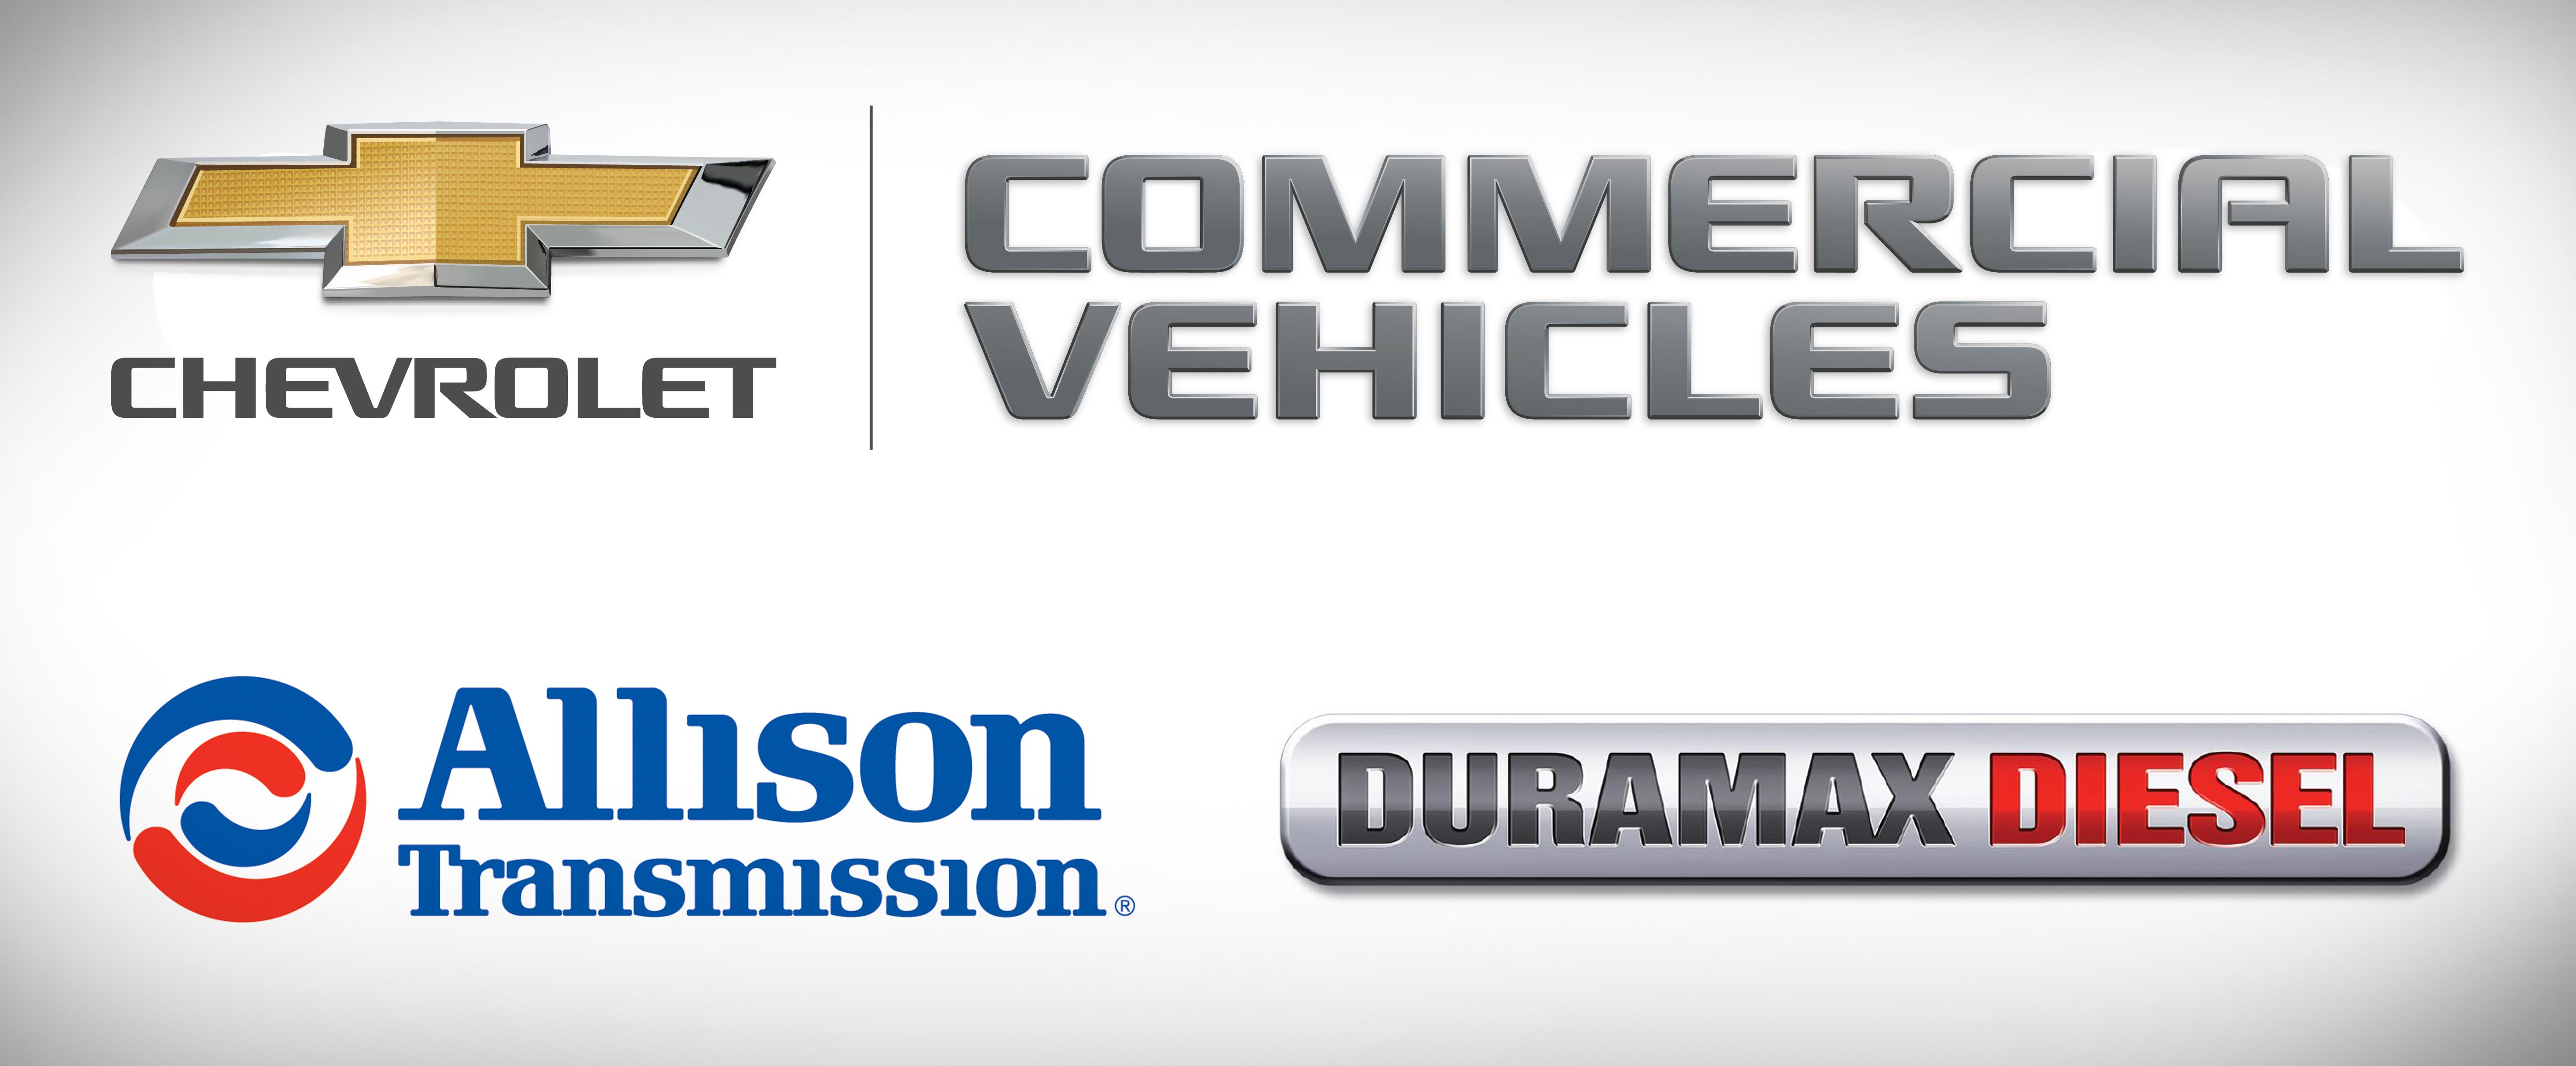 Duramax Diesel Allison Transmission Will Power Chevrolet S All New Medium Duty Commercial Truck